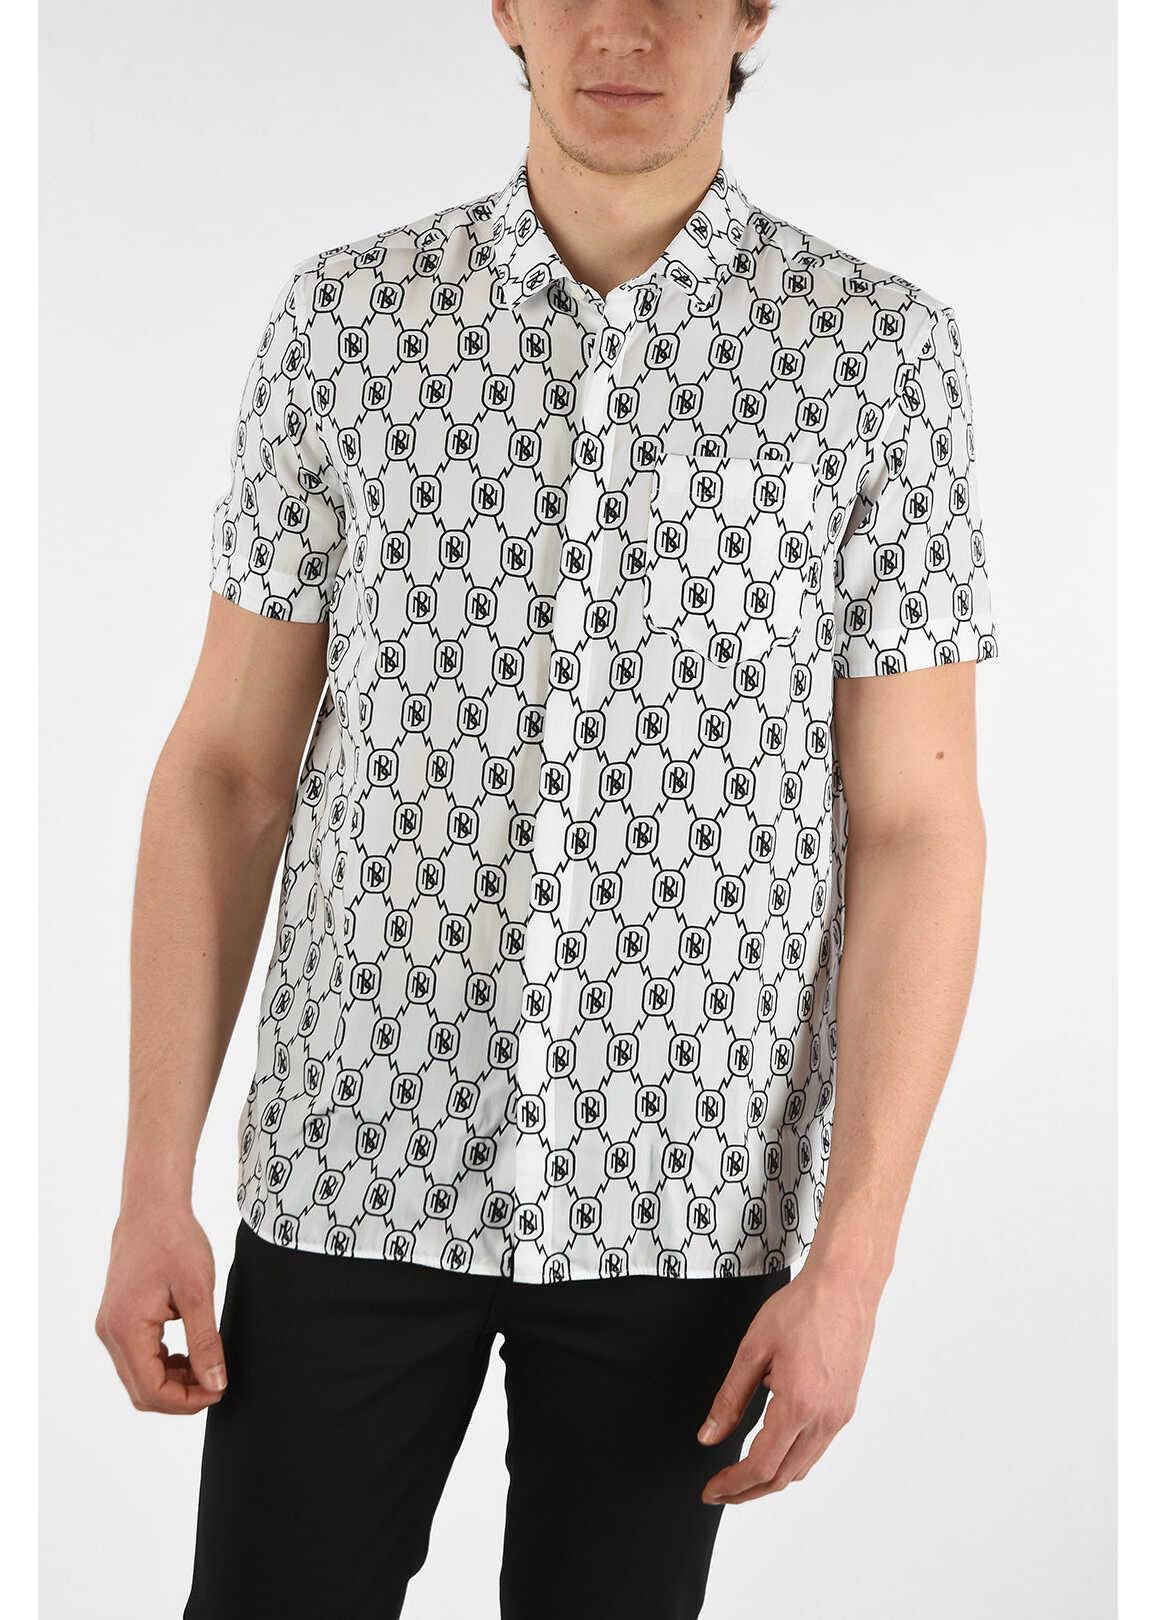 Neil Barrett Short Sleeve ALL-OVER MONOGRAM Spread Collar Shirt with Patc WHITE imagine